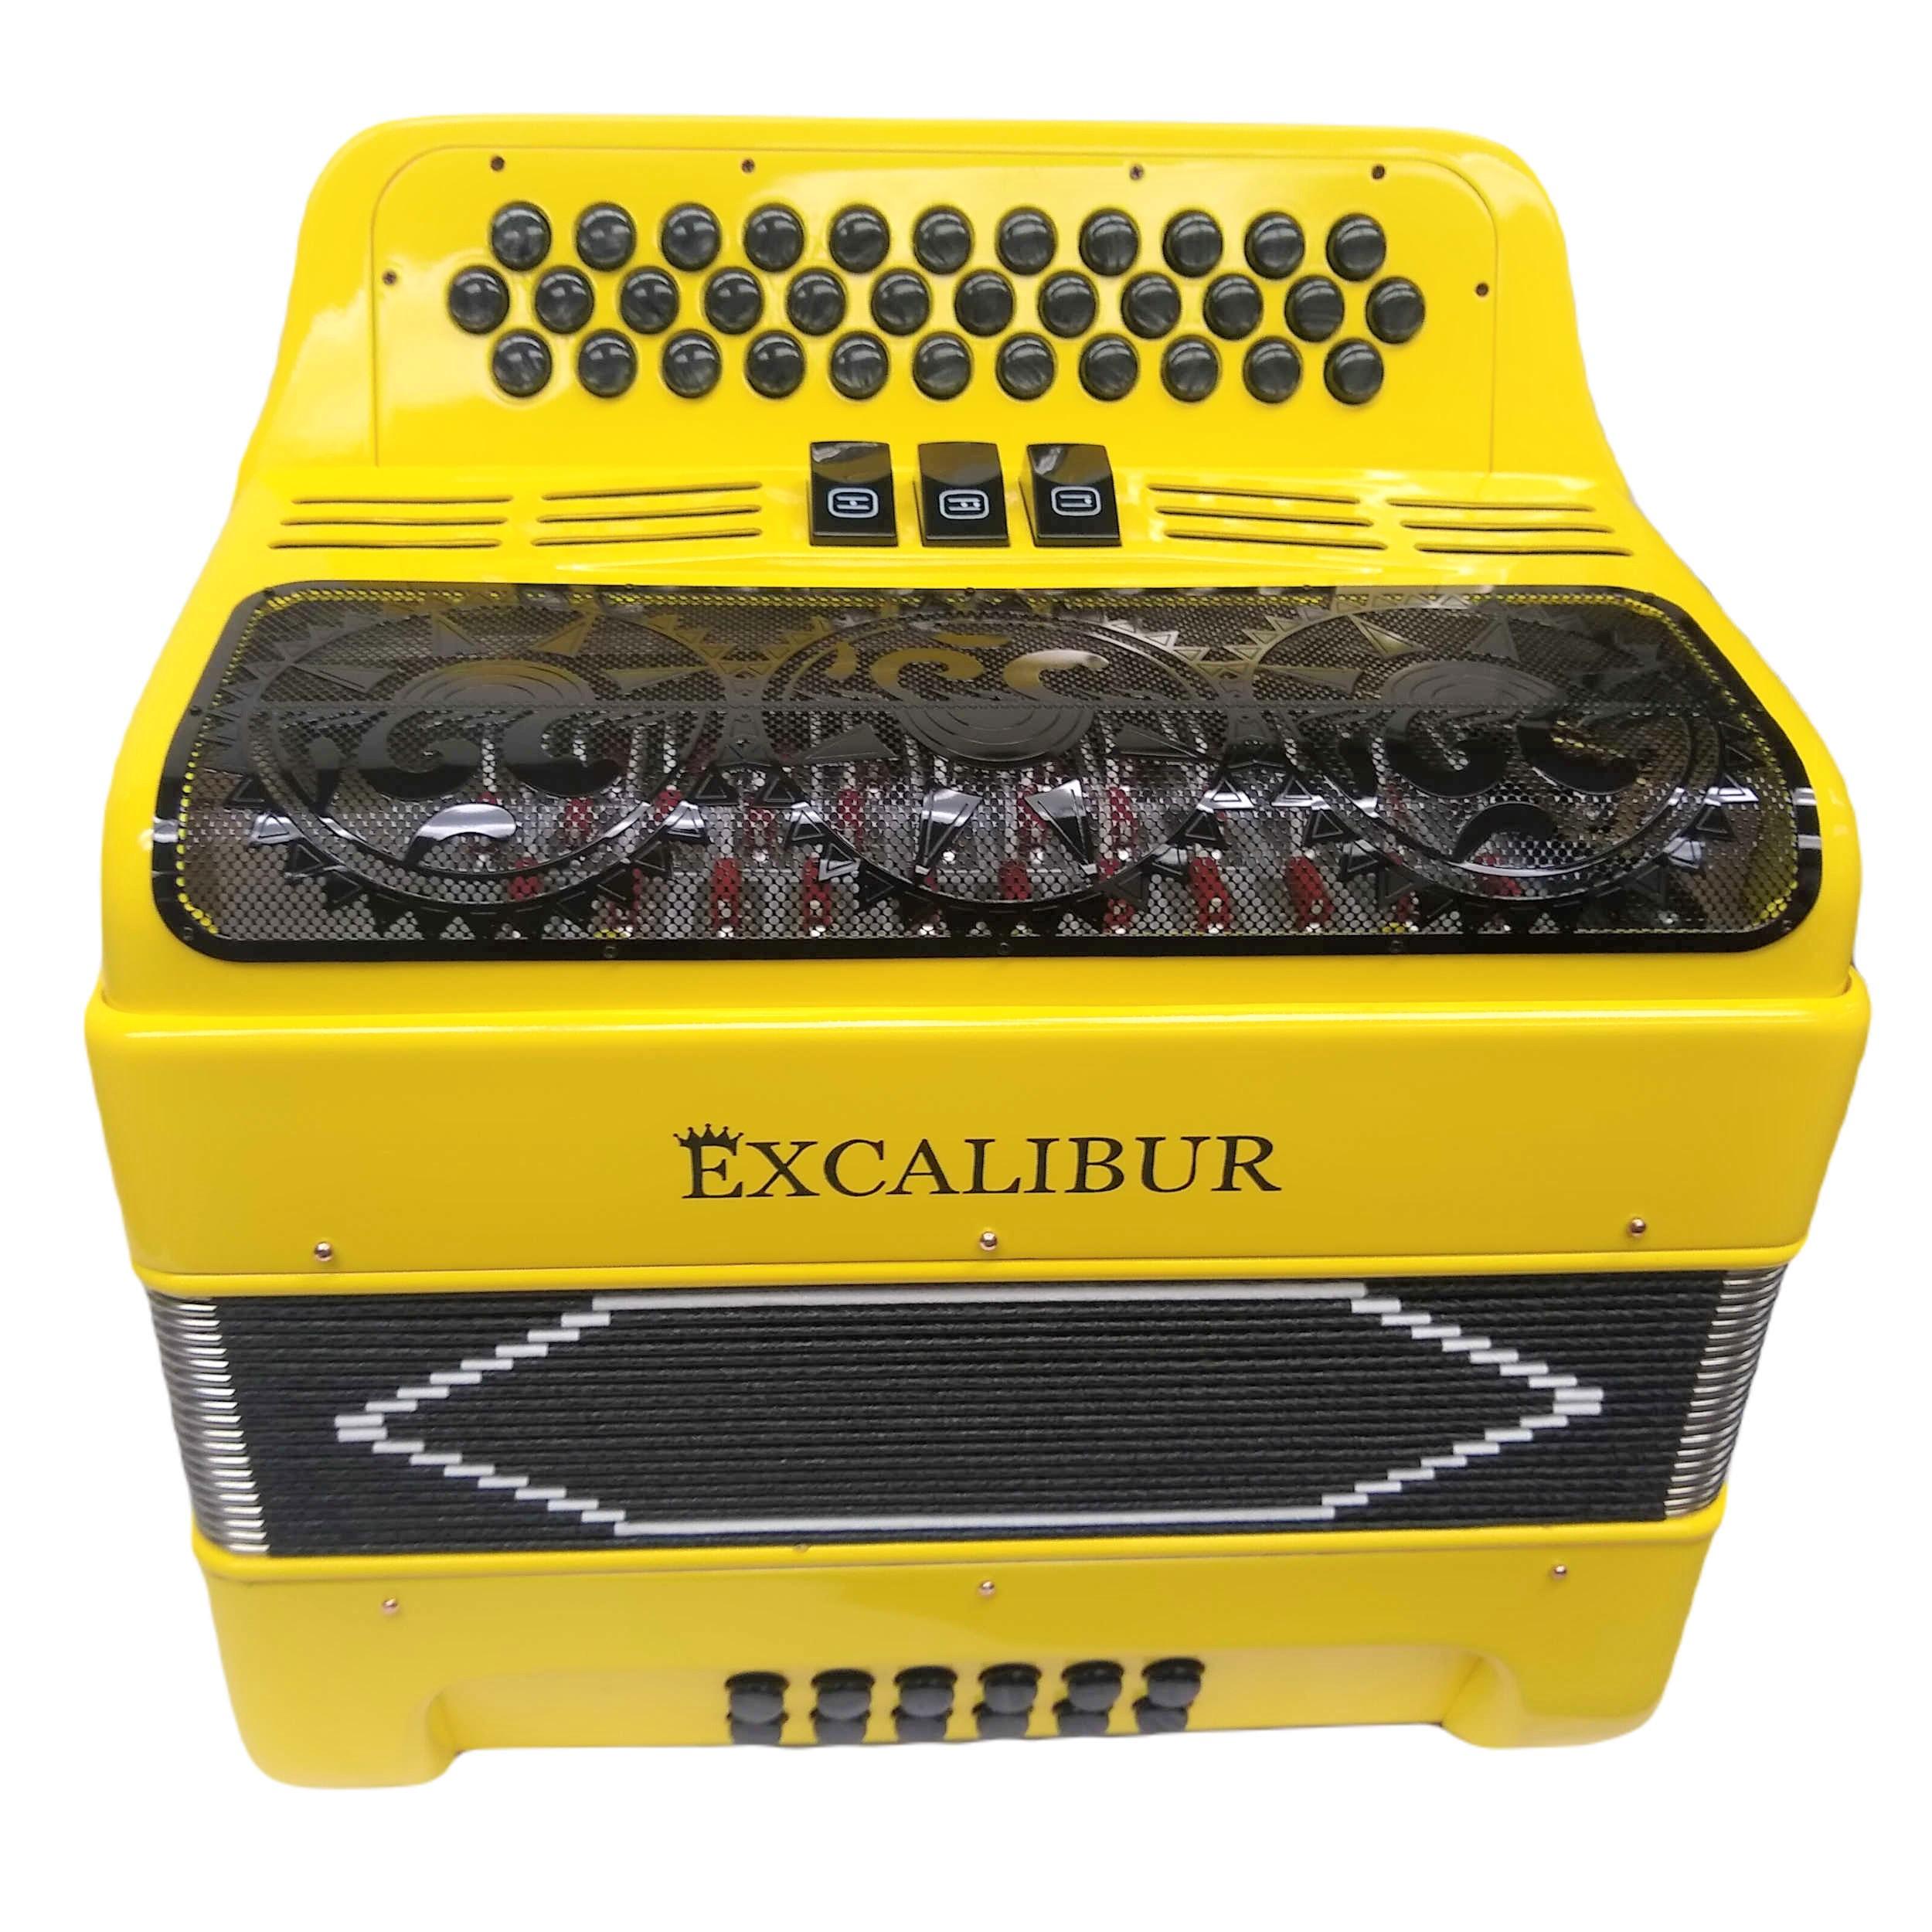 Excalibur Super Classic PSI 3 Switch Button Accordion - Lambo Yellow